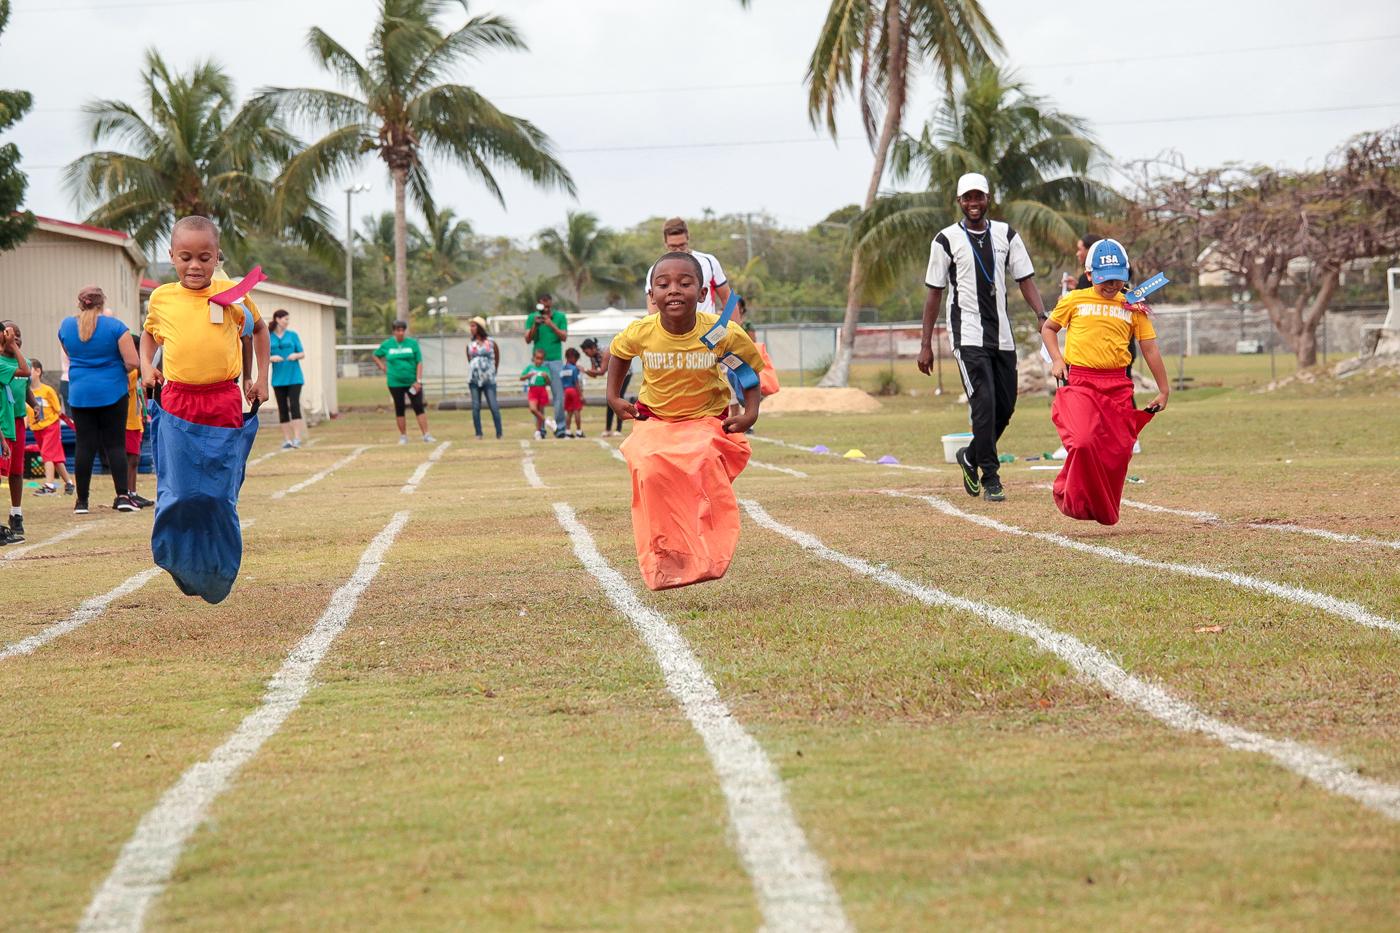 Triple C School's Sports Day A Blast | Cayman Compass with Triple C School